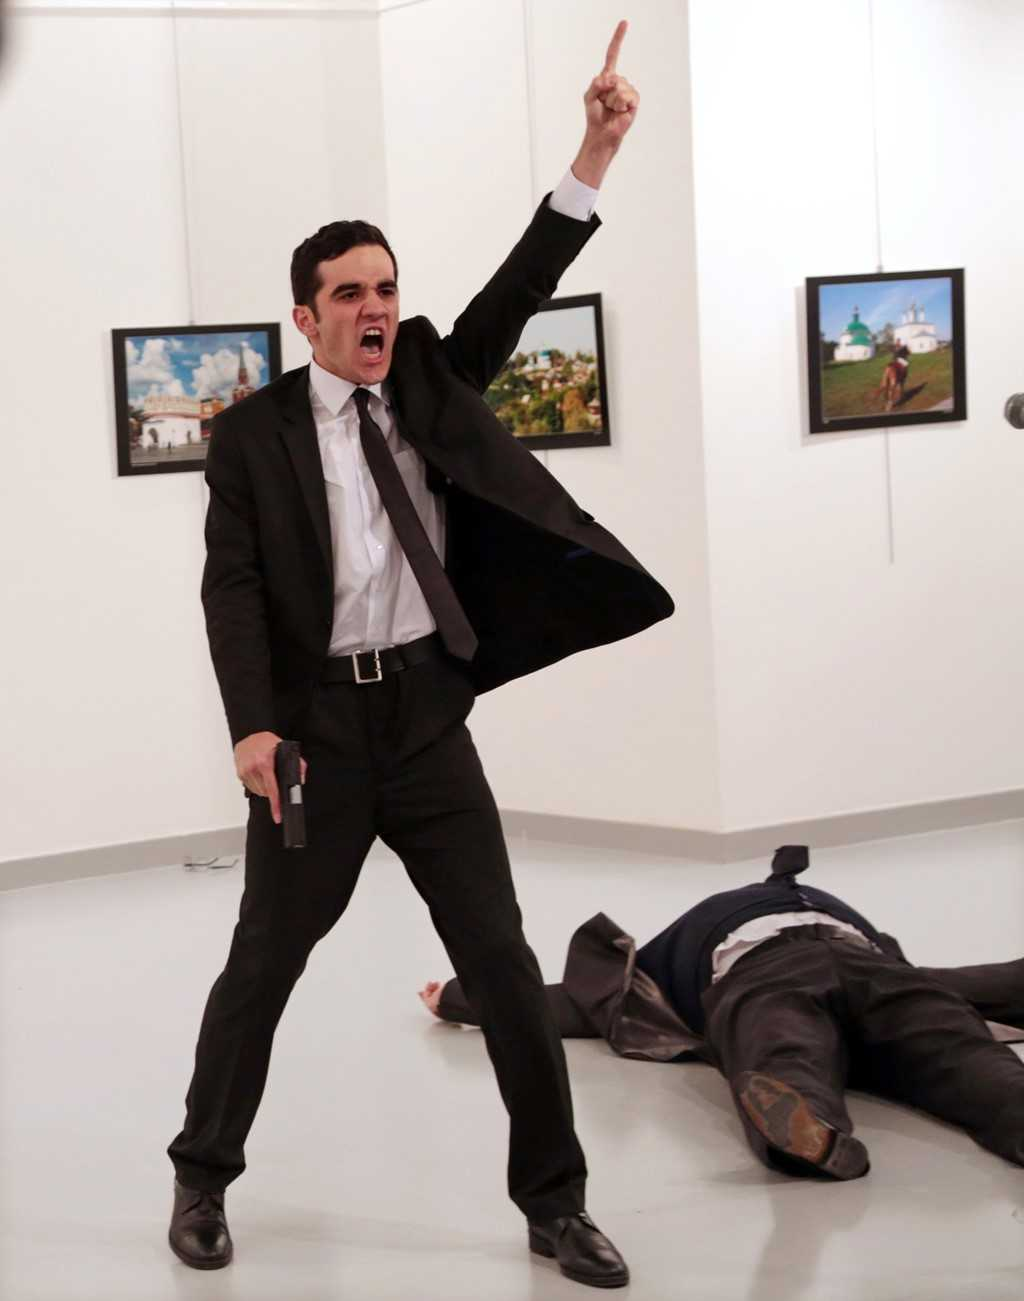 Buc anh dai su Nga bi am sat doat giai World Press Photo 2017 hinh anh 1